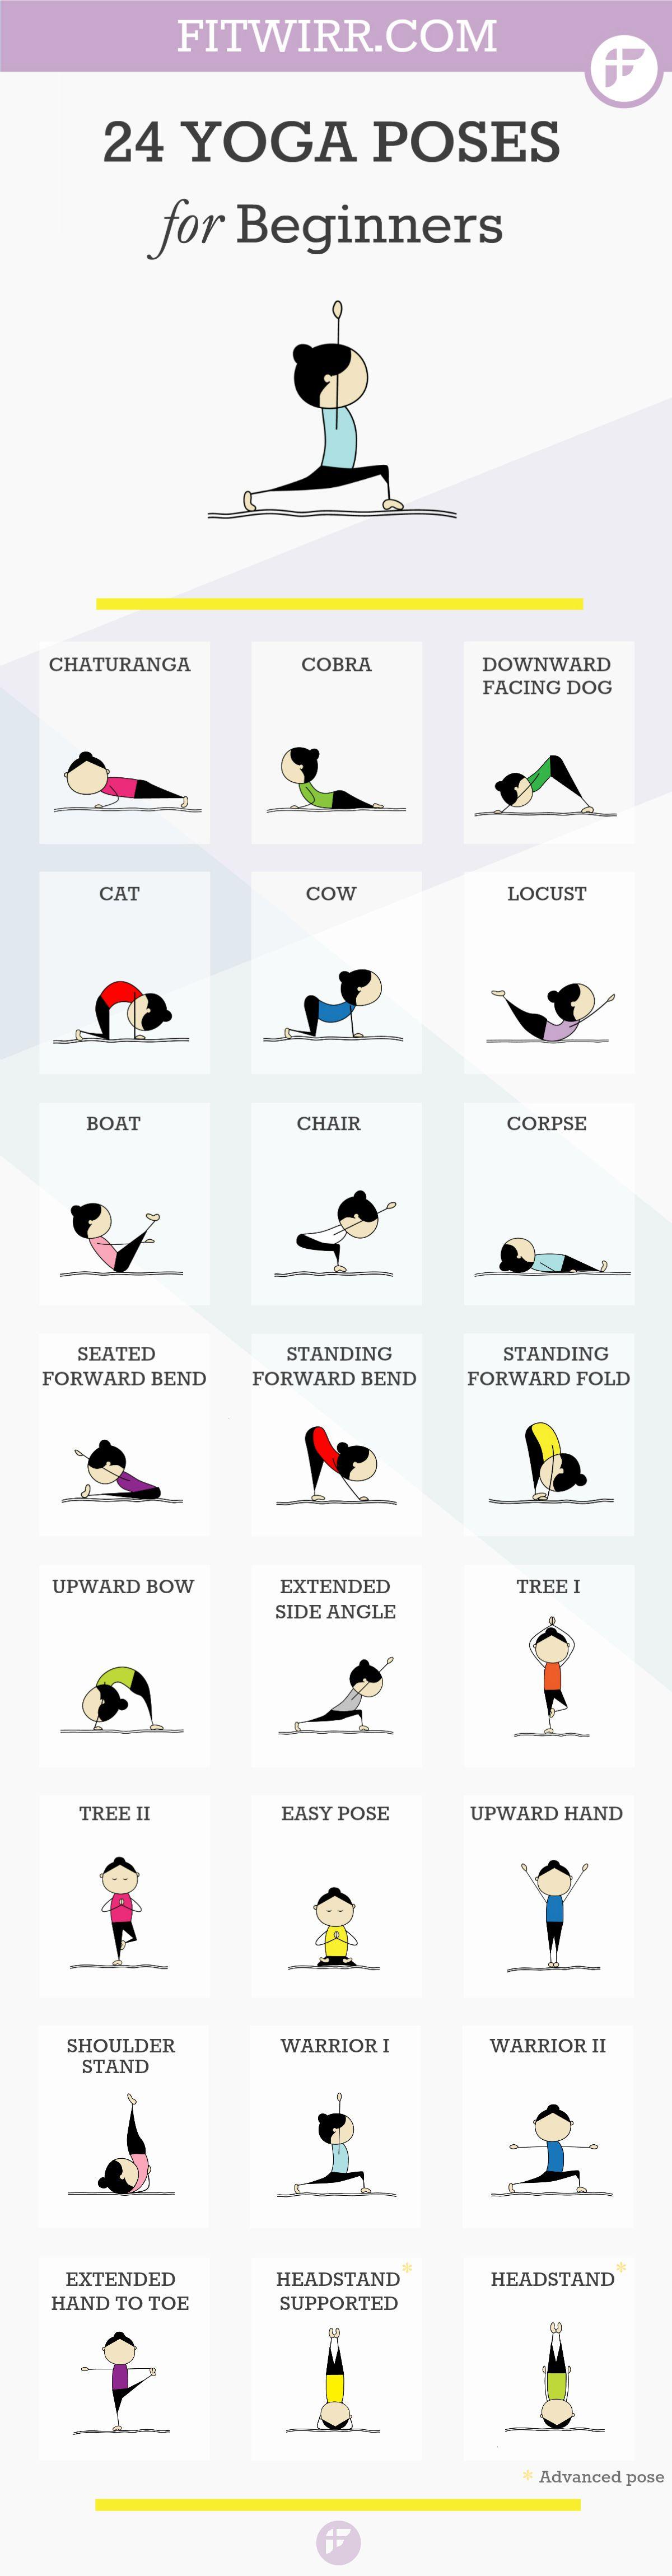 yoga principiantes fitwirr